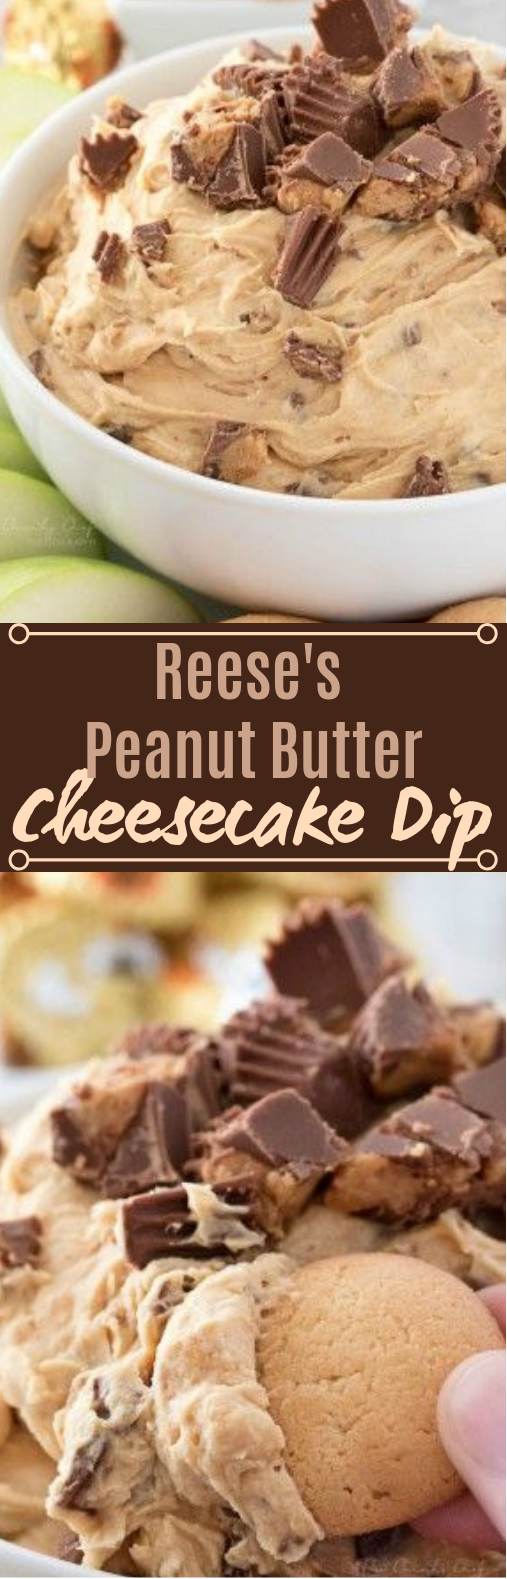 PEANUT BUTTER CHEESECAKE DIP #desserts #peanutbutter